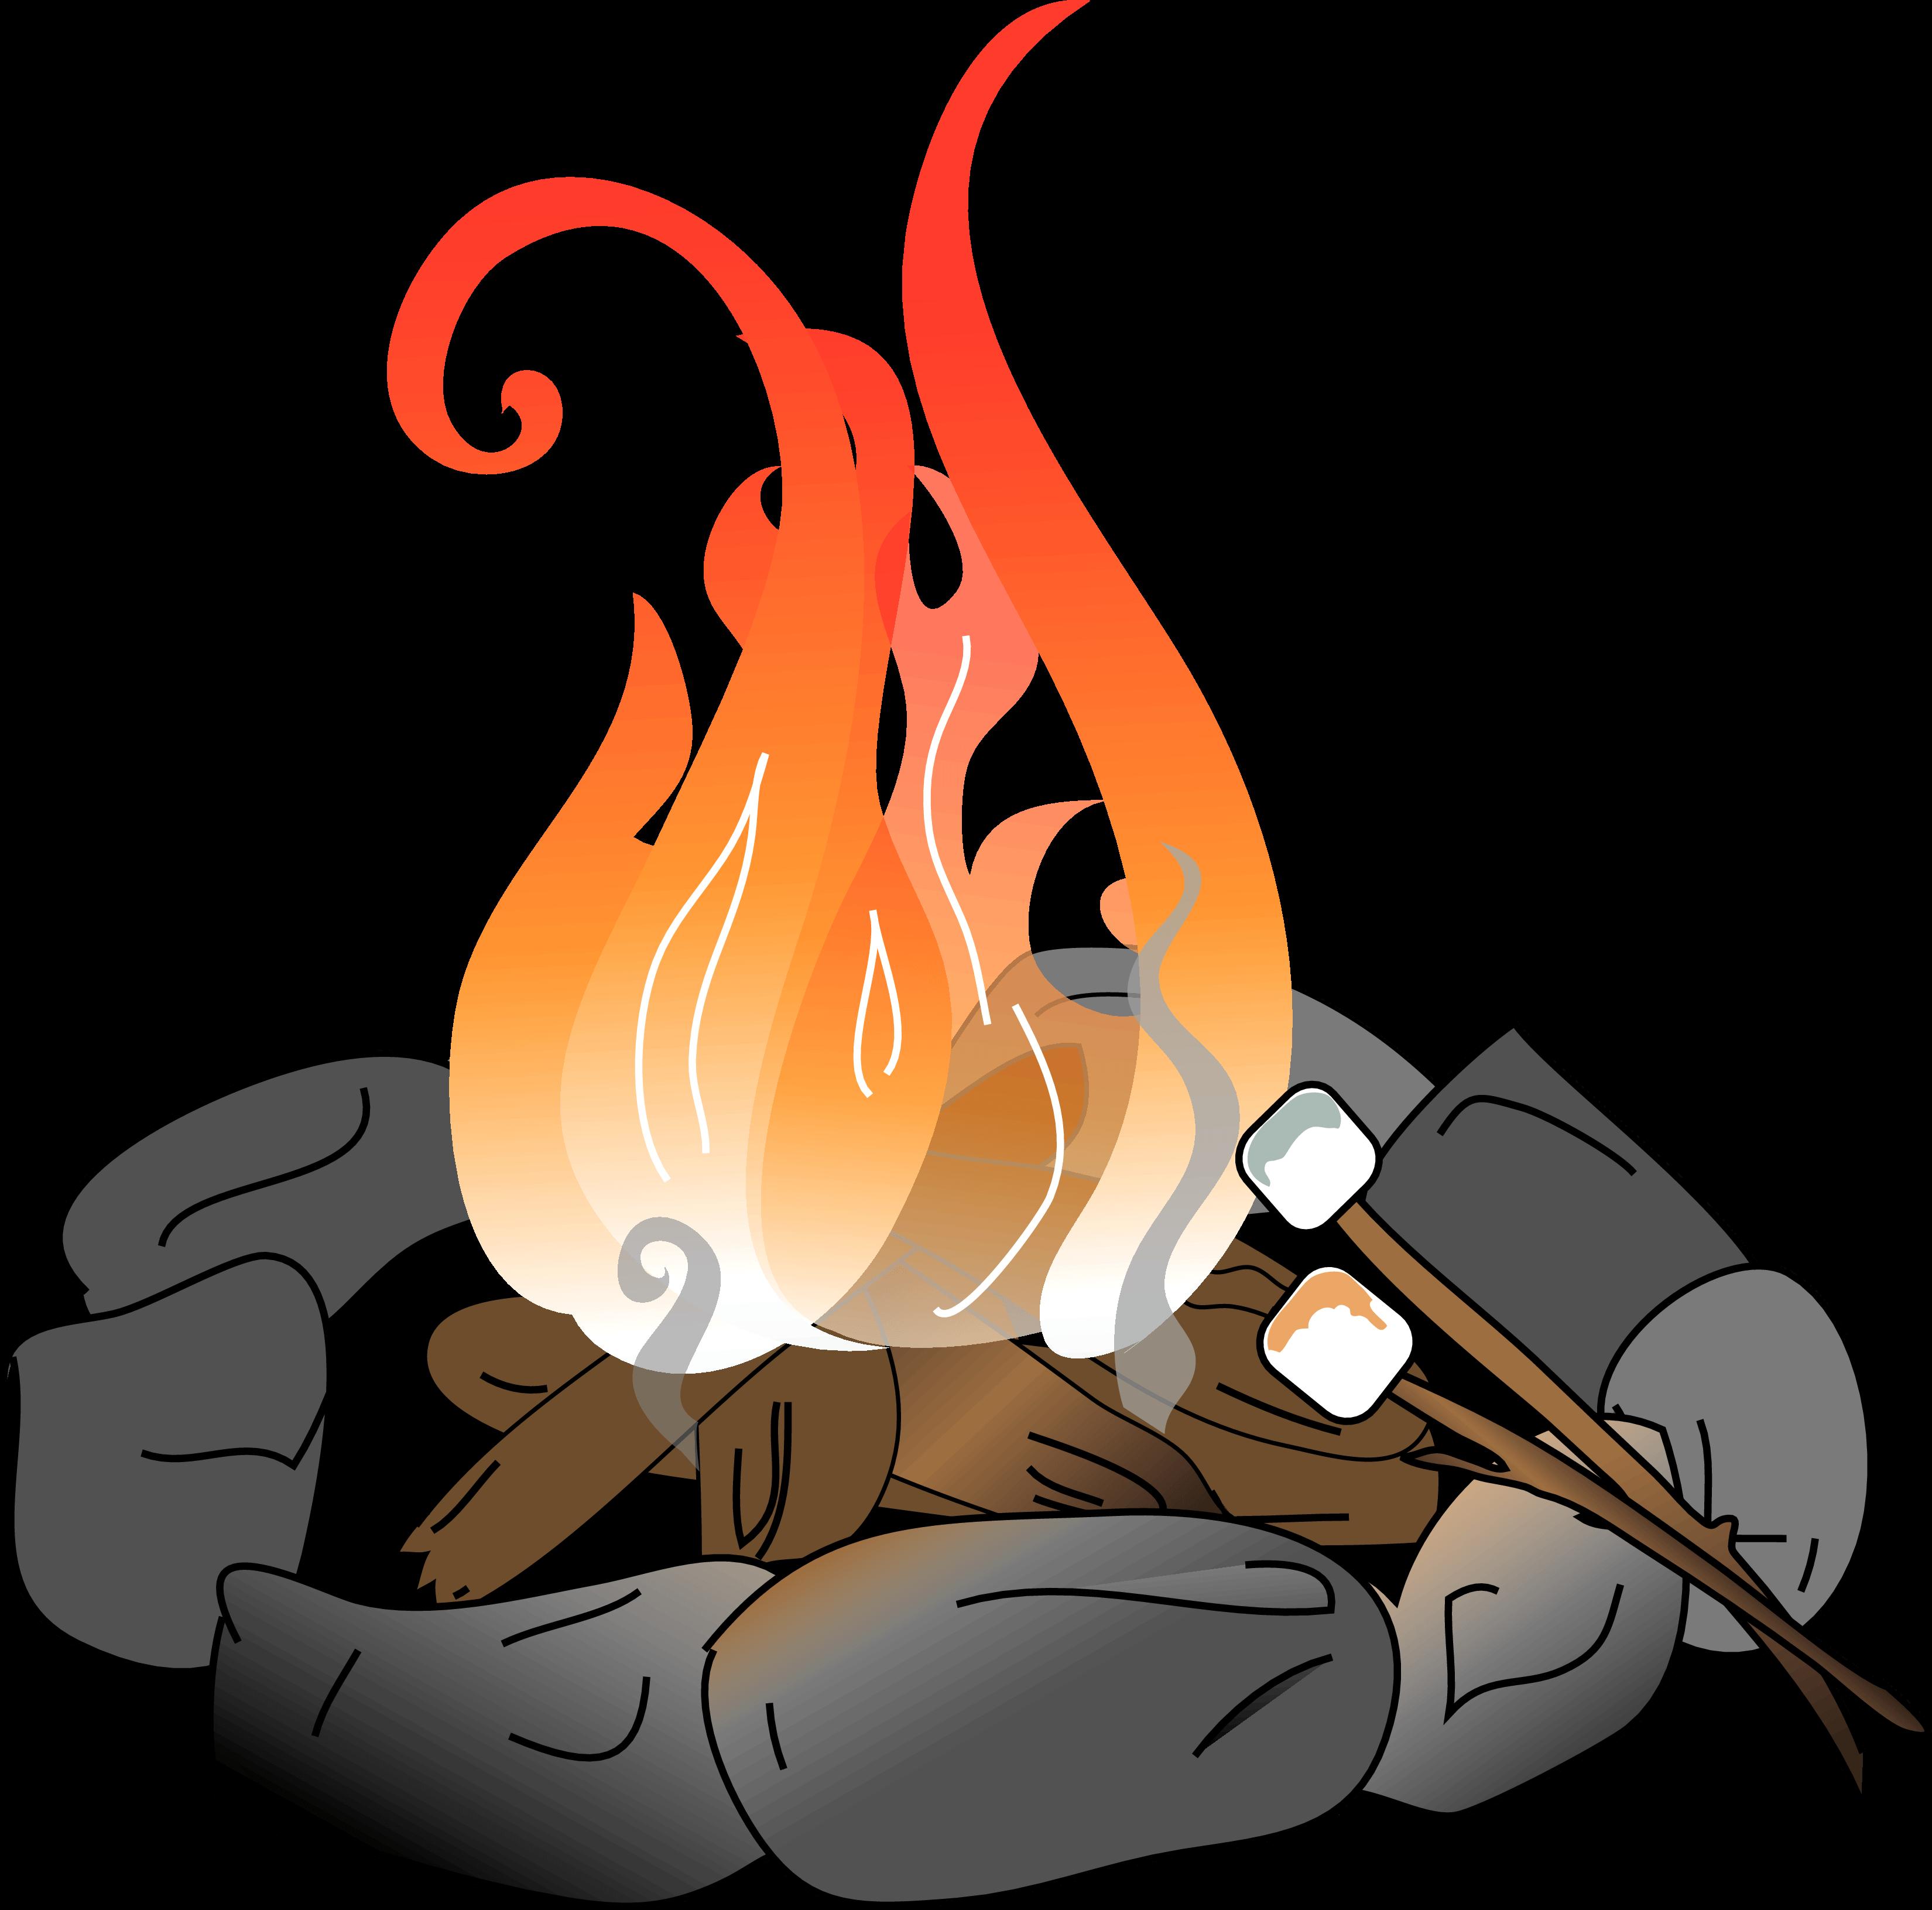 Roasting marshmallows free download. Fire clipart bonfire night